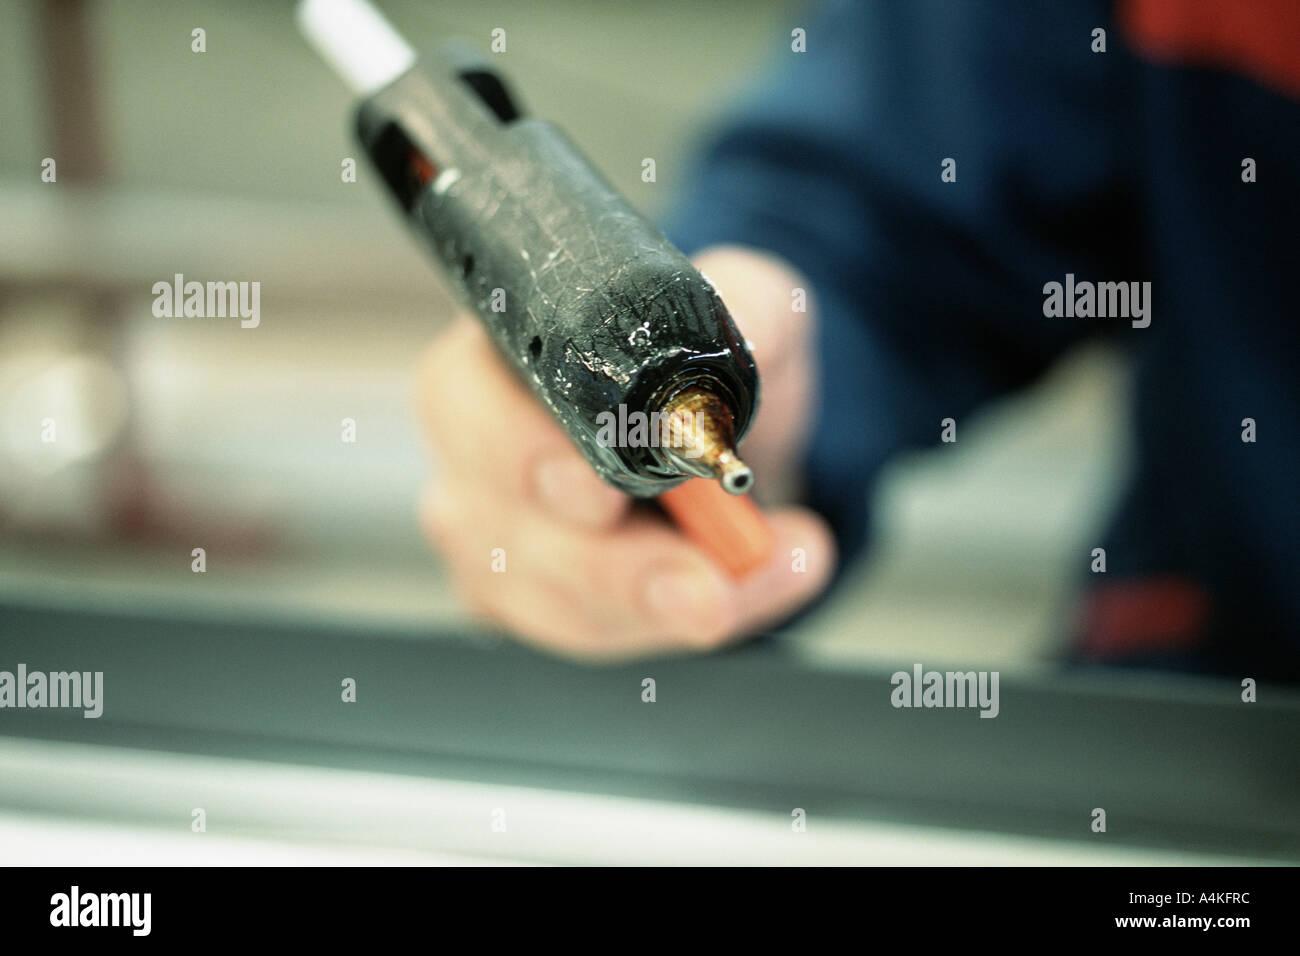 Glue gun - Stock Image